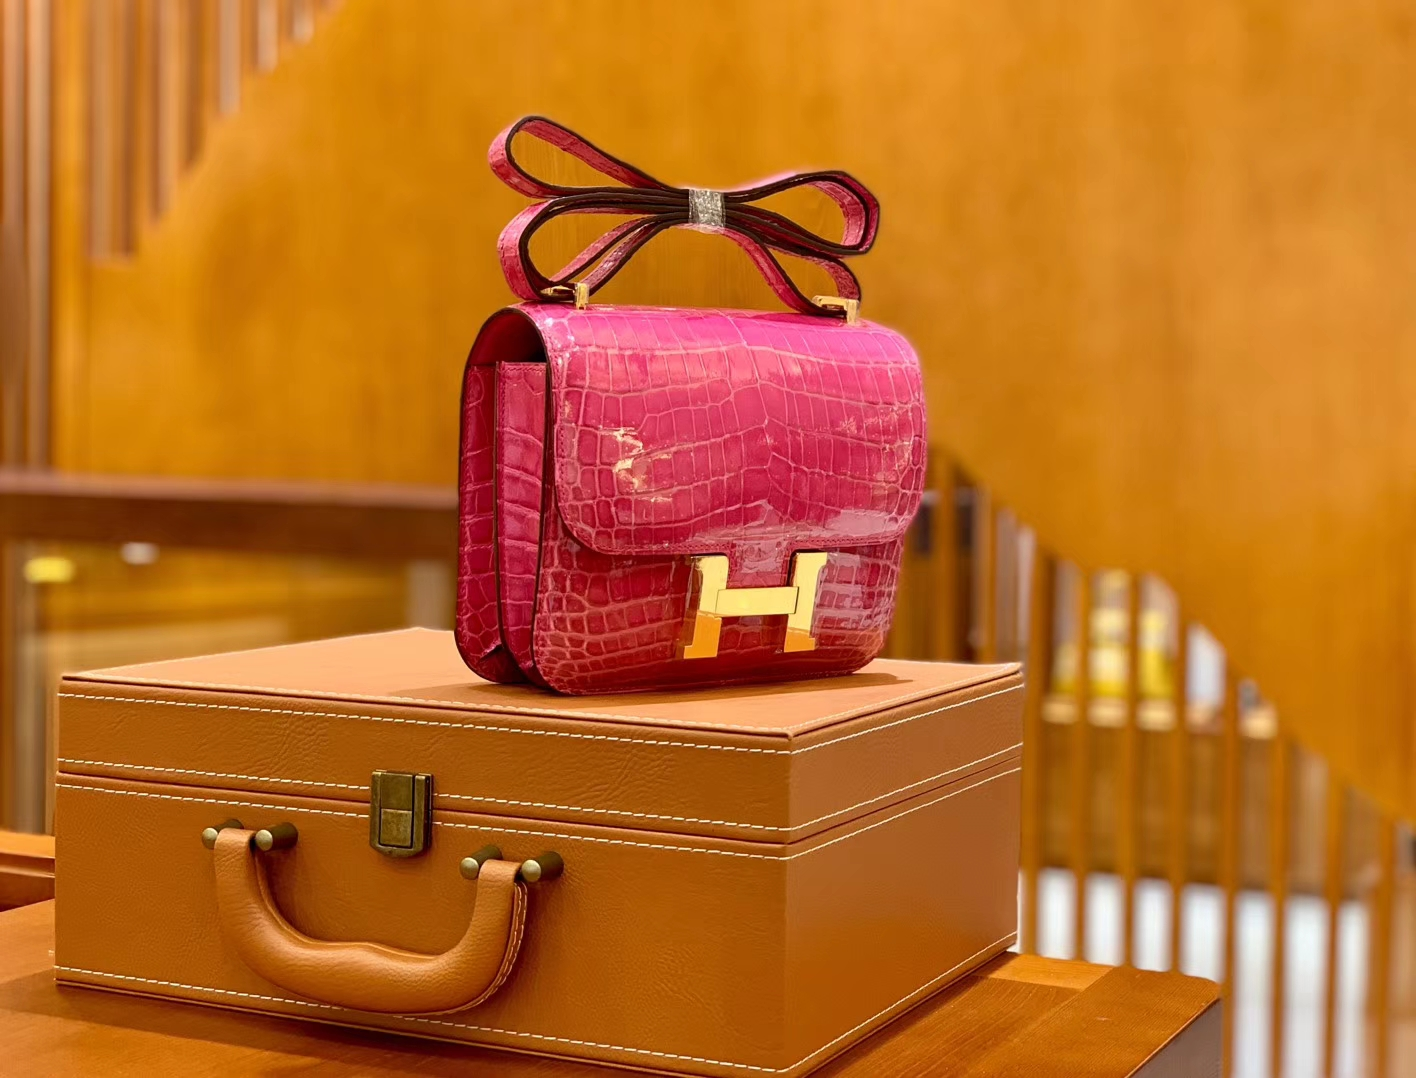 Hermès(爱马仕)Constance 空姐包 桃红 一级皮 尼罗鳄 顶端级别 臻品级别 金扣 18cm